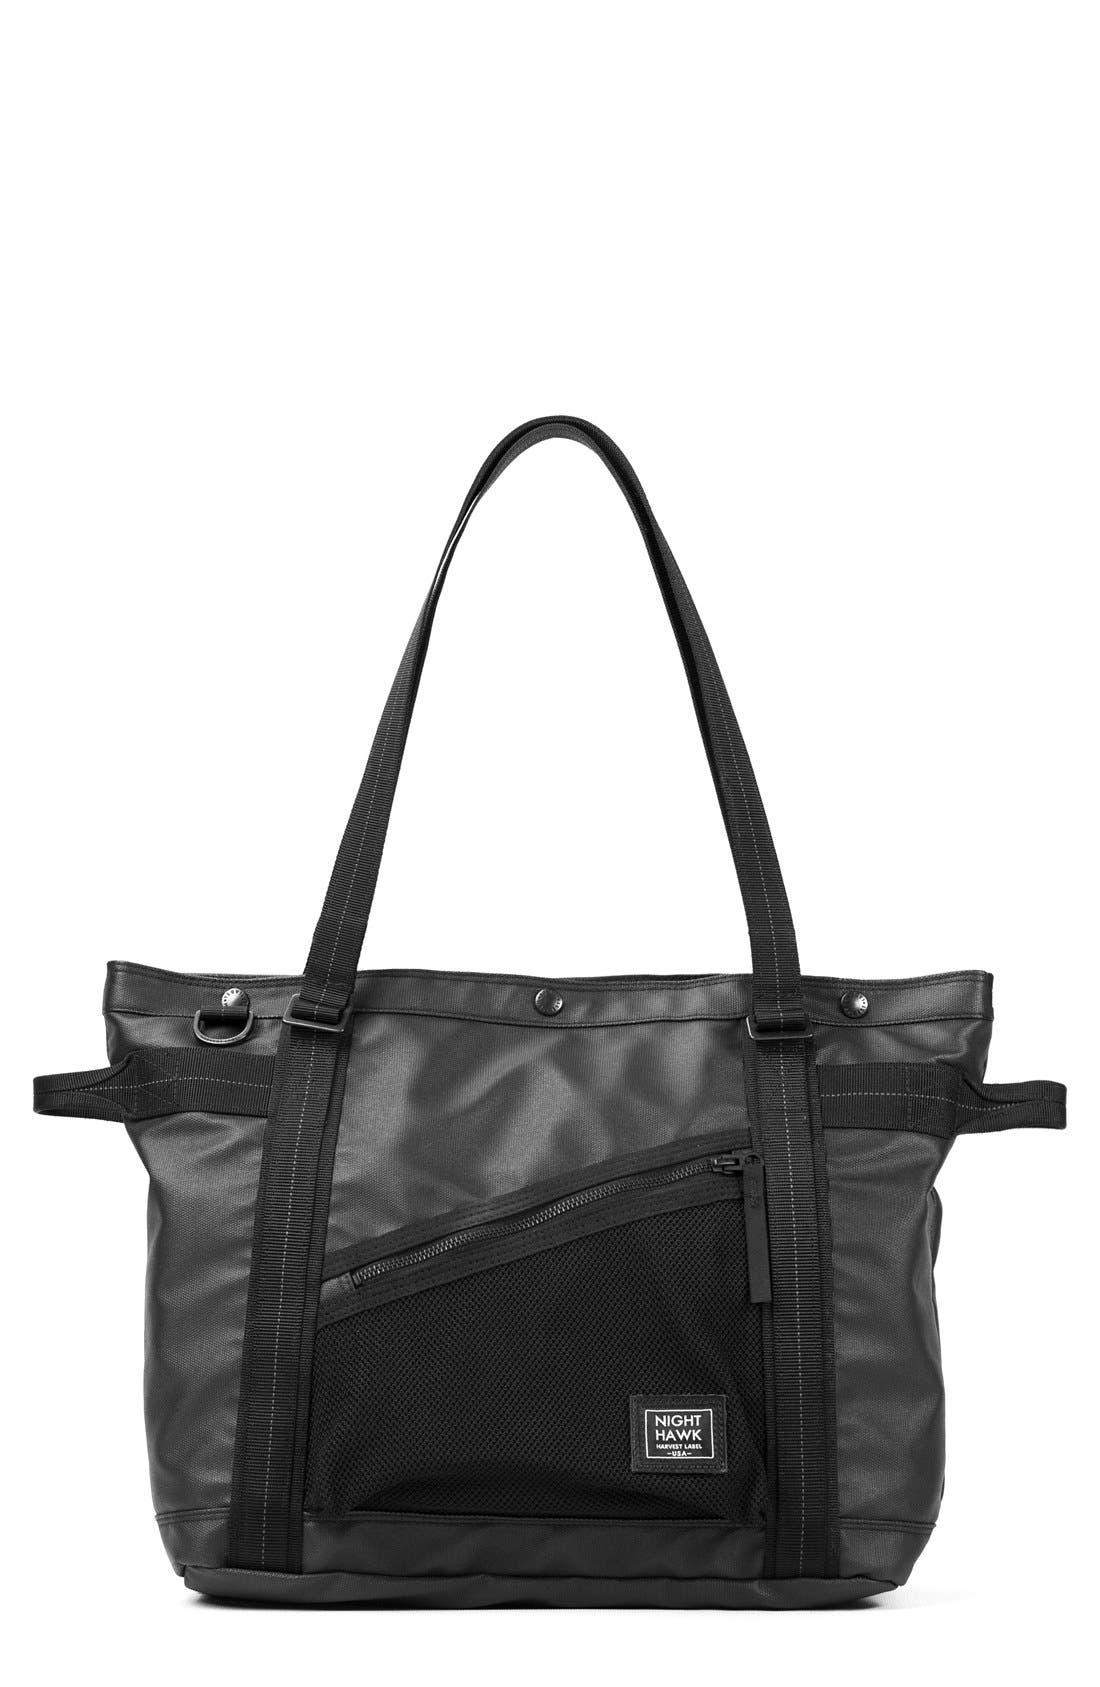 'NightHawk' Tote Bag,                             Main thumbnail 1, color,                             BLACK